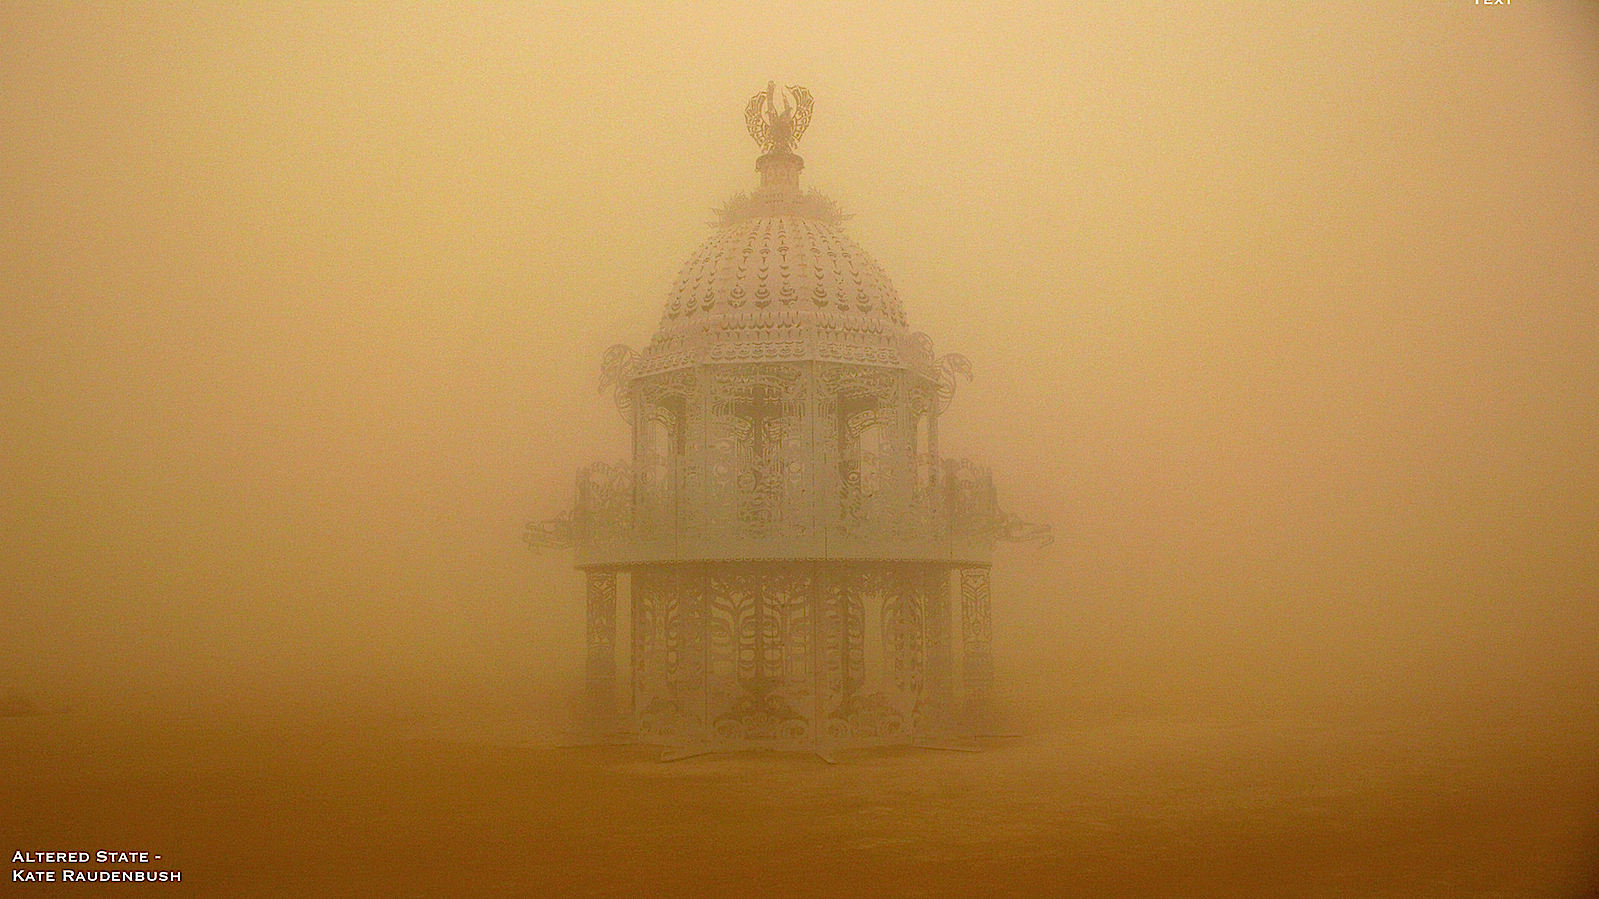 08AlteredState-sandstorm-KRaudenbush.jpg